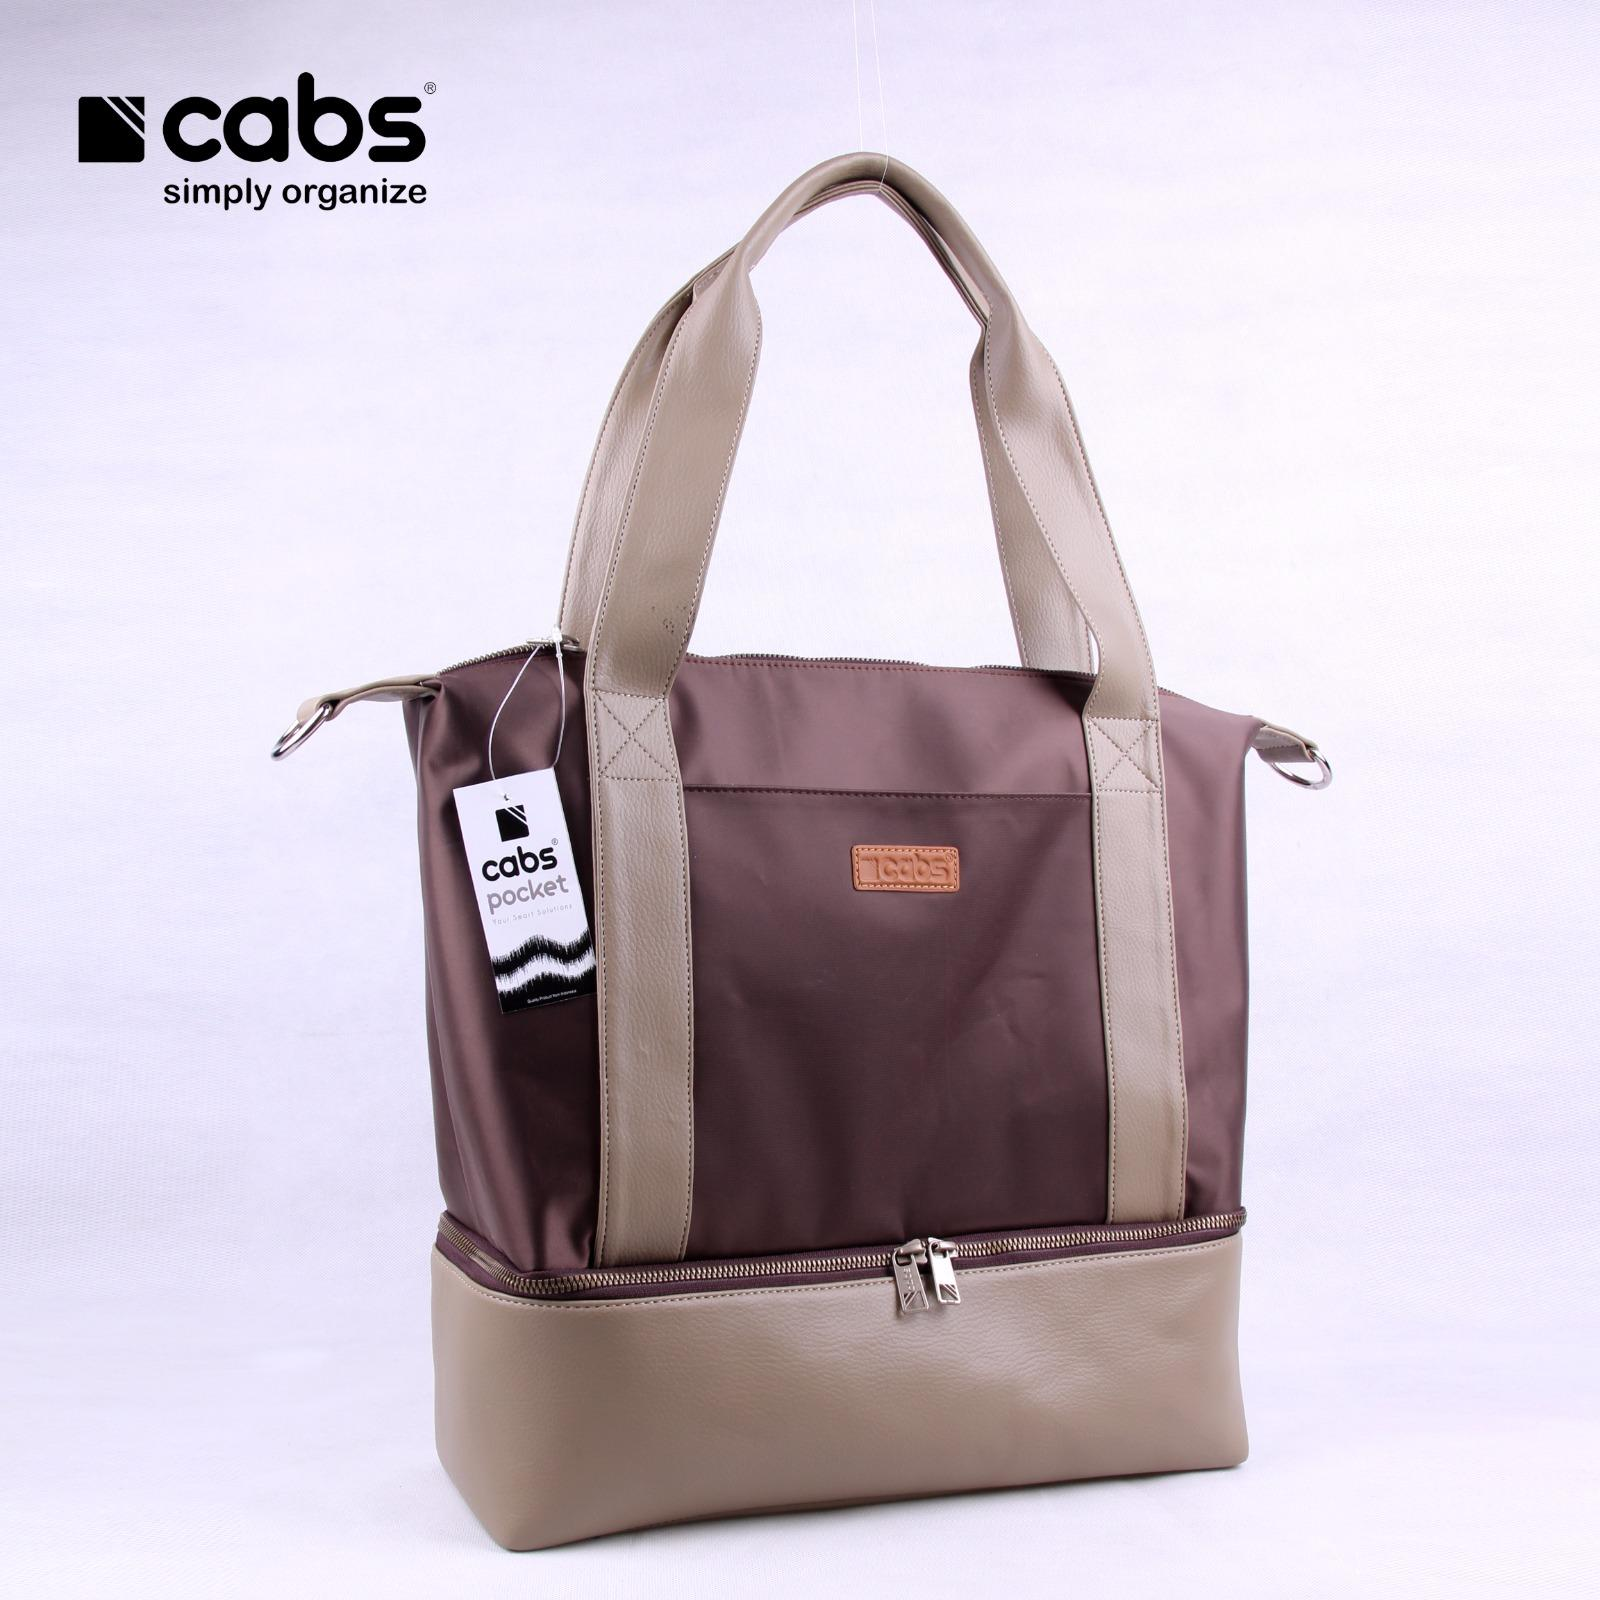 Cabs Pocket Megan (Tas Wanita Selempang Cewek Tas Jinjing Tote Bag Multifungsi Tas Bayi Sling Bag S